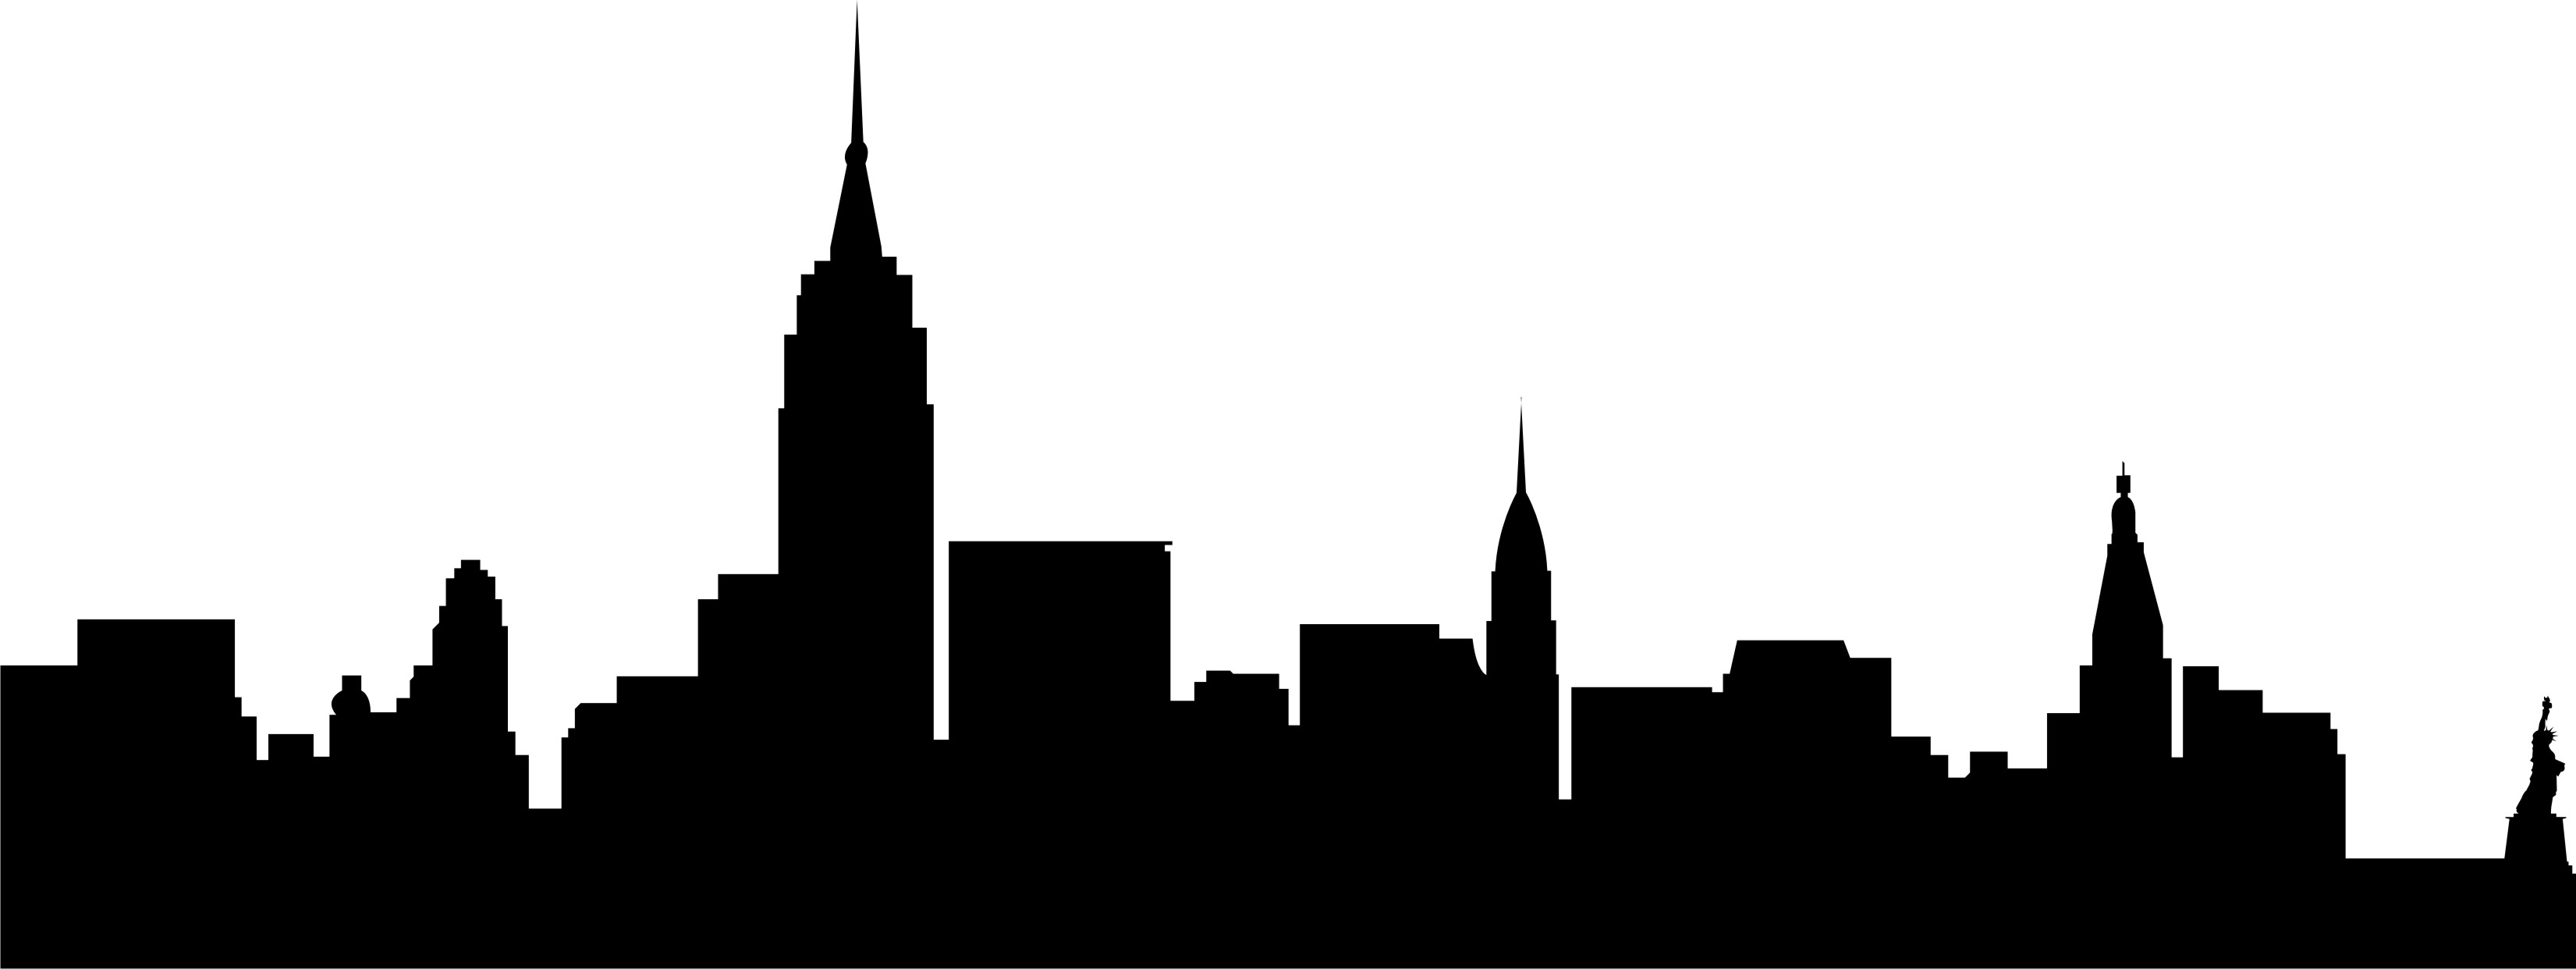 New York City Clipart - Blogsbeta-New York City Clipart - Blogsbeta-4